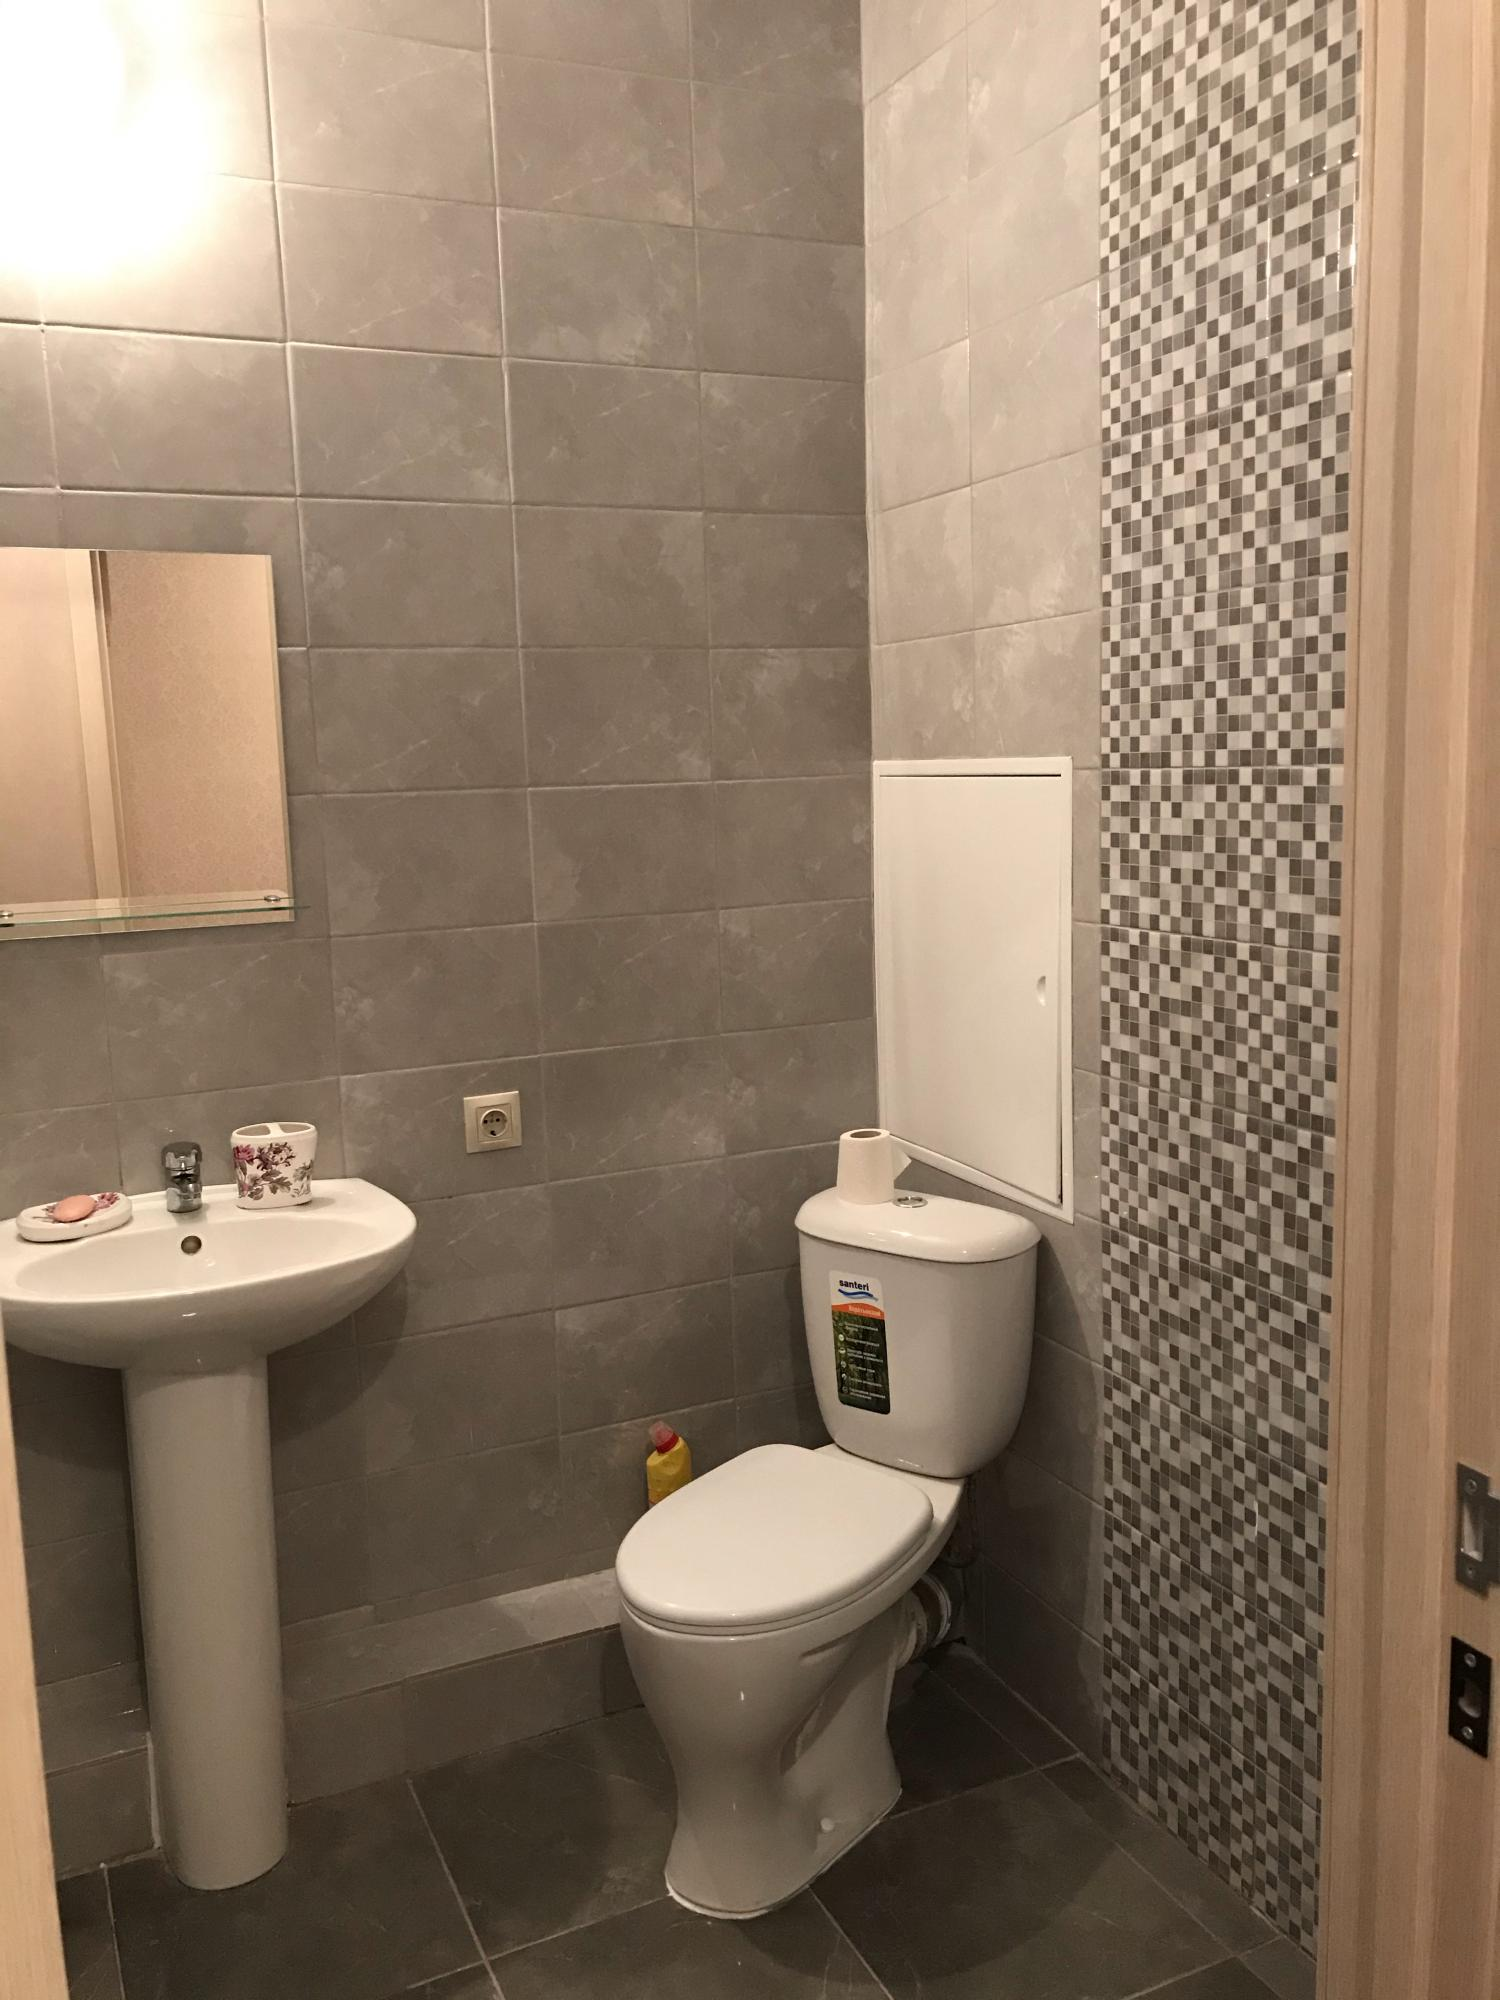 Квартира, 1 комната, 35 м² 89258601492 купить 7